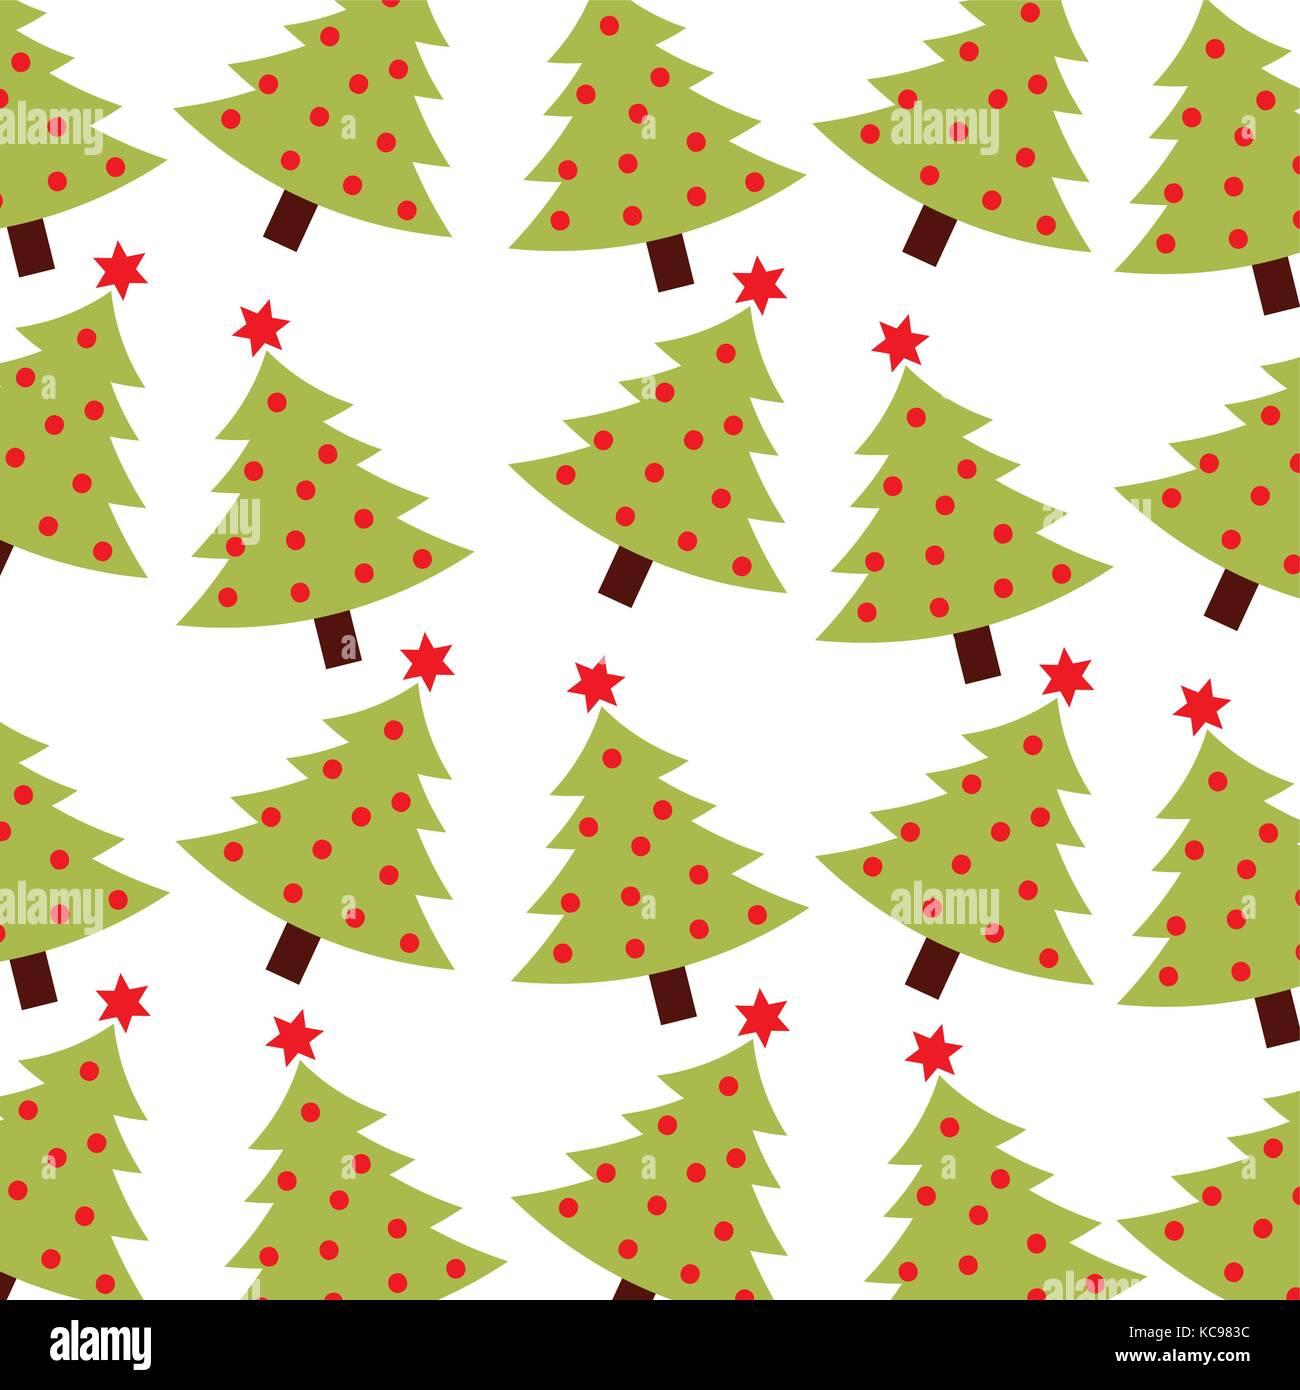 Christmas Green Tree Pine Decoration Celebration Seamless Pattern